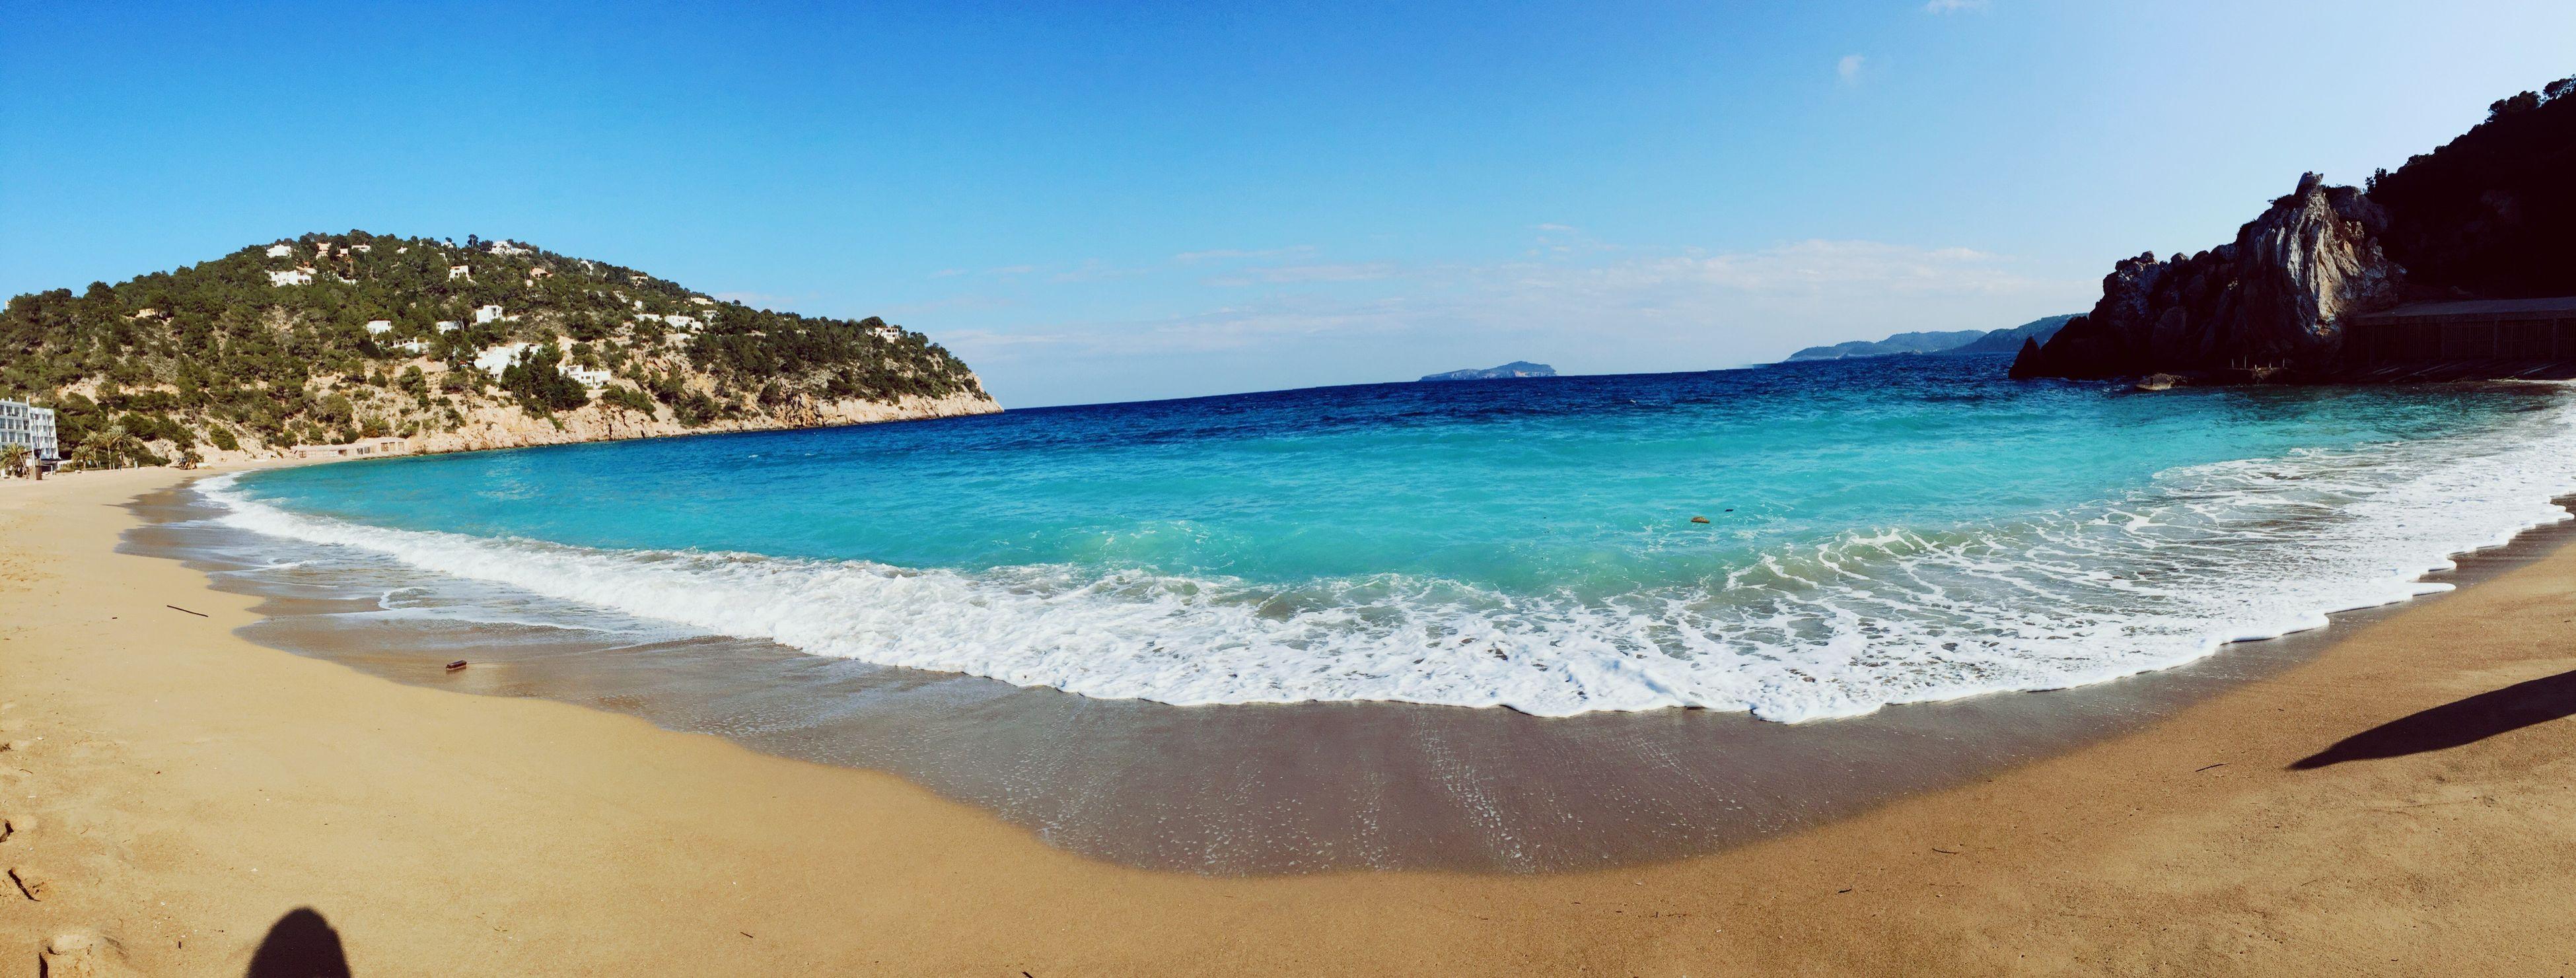 Happythursday  Sun Beachphotography Aiguesblanques Ibiza SPAIN